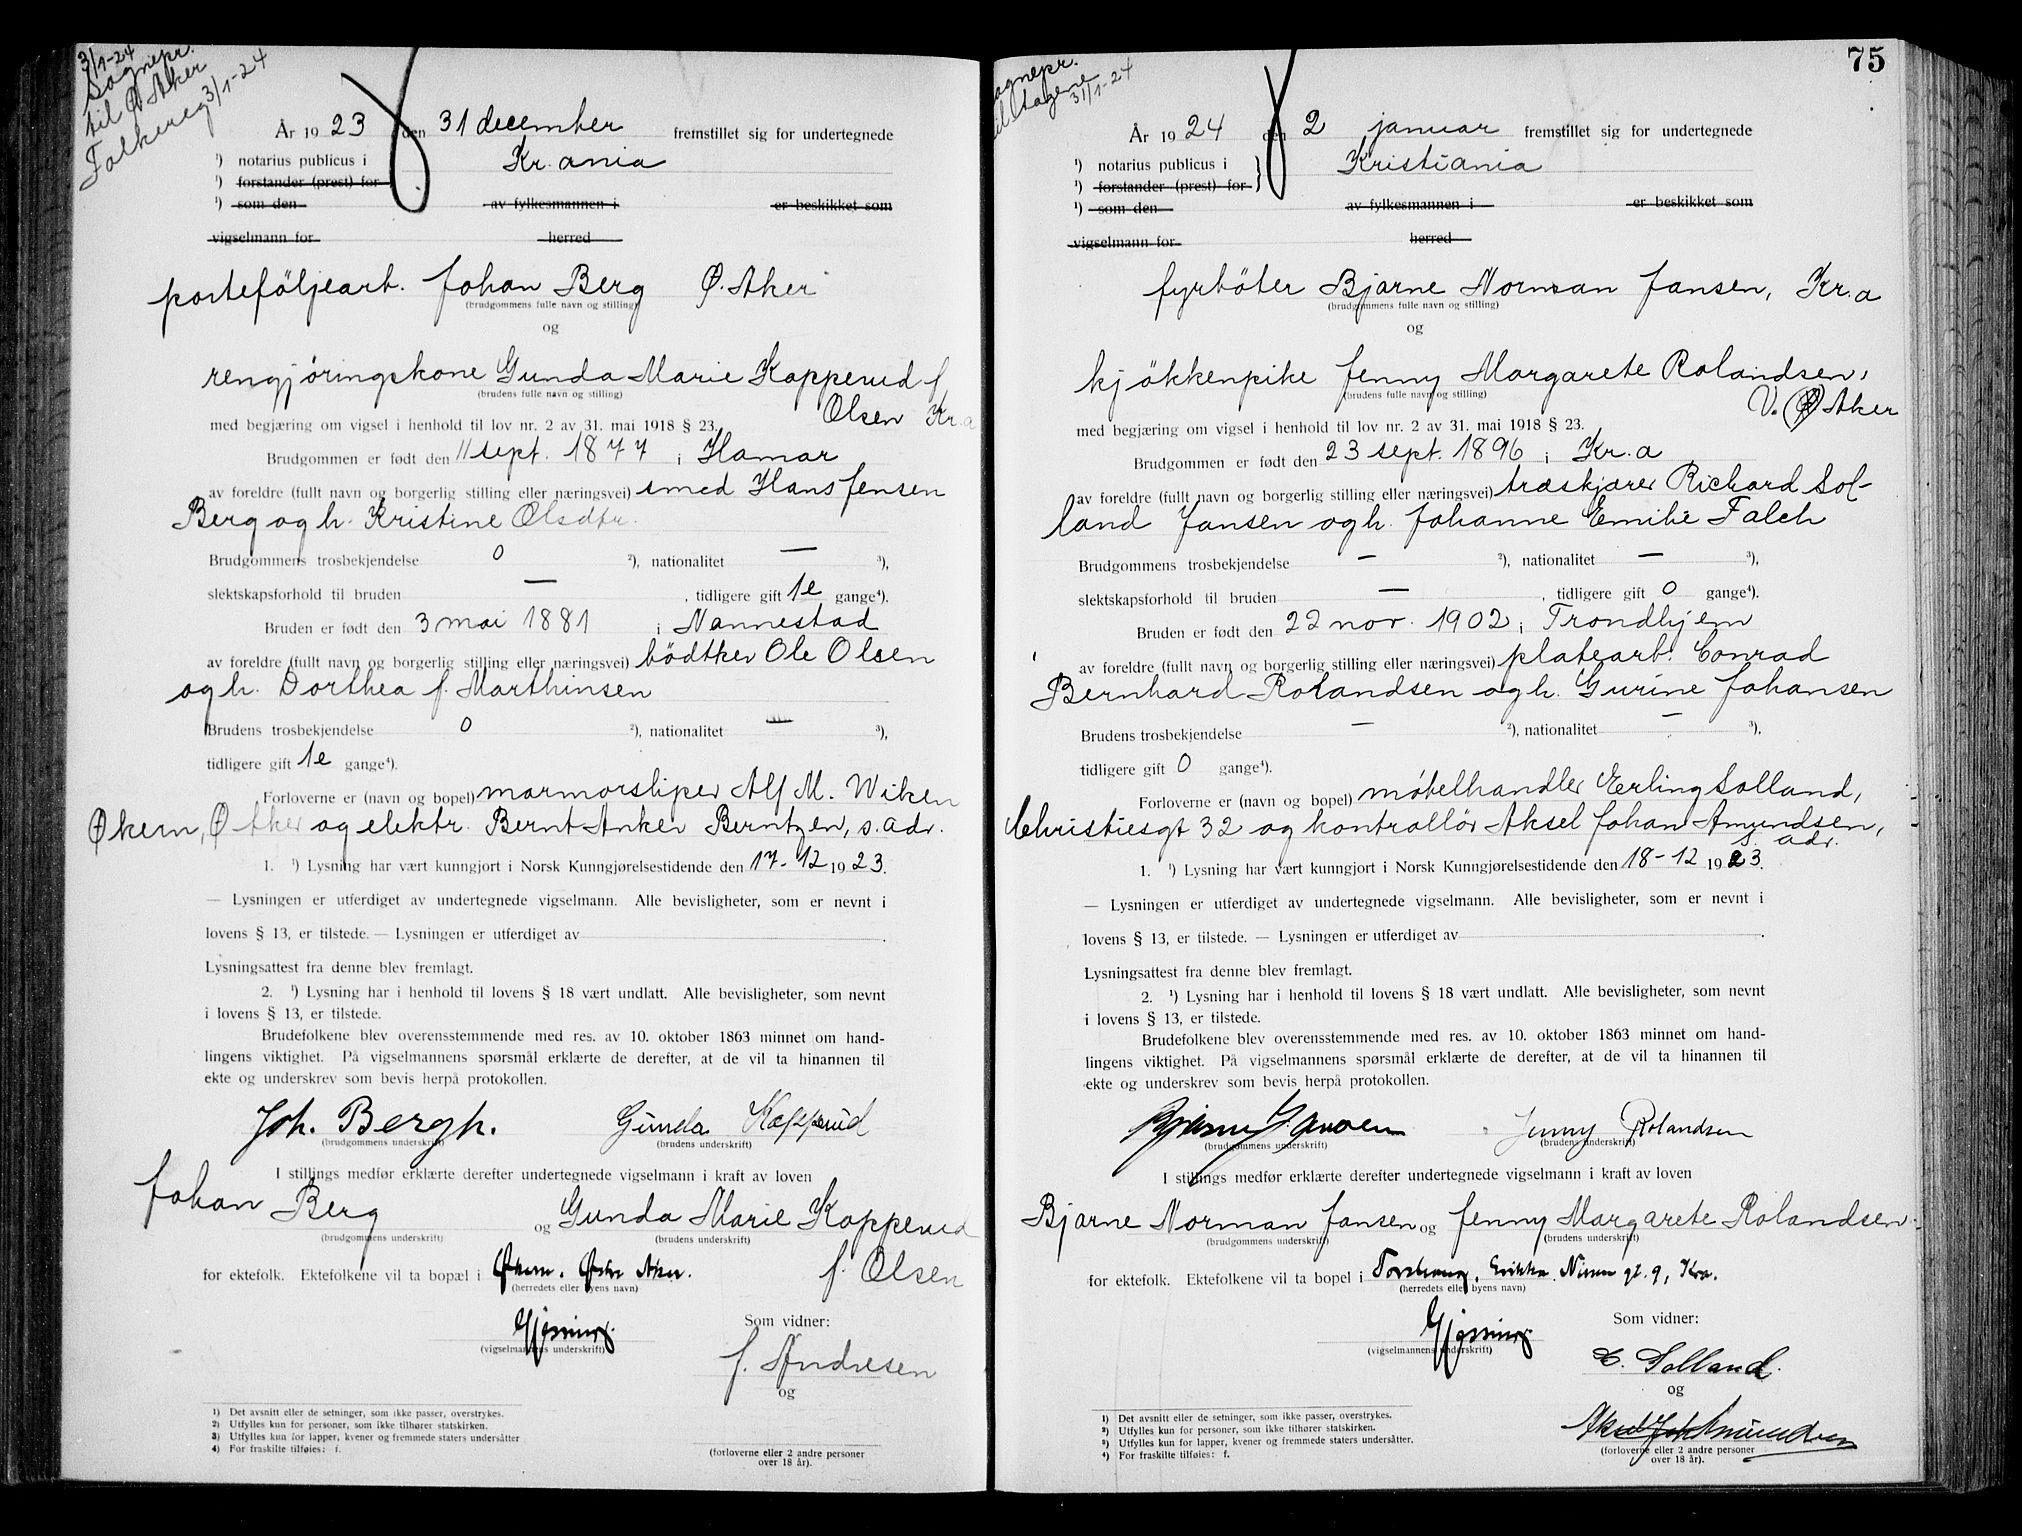 SAO, Oslo byfogd avd. I, L/Lb/Lbb/L0016: Notarialprotokoll, rekke II: Vigsler, 1922-1924, s. 74b-75a